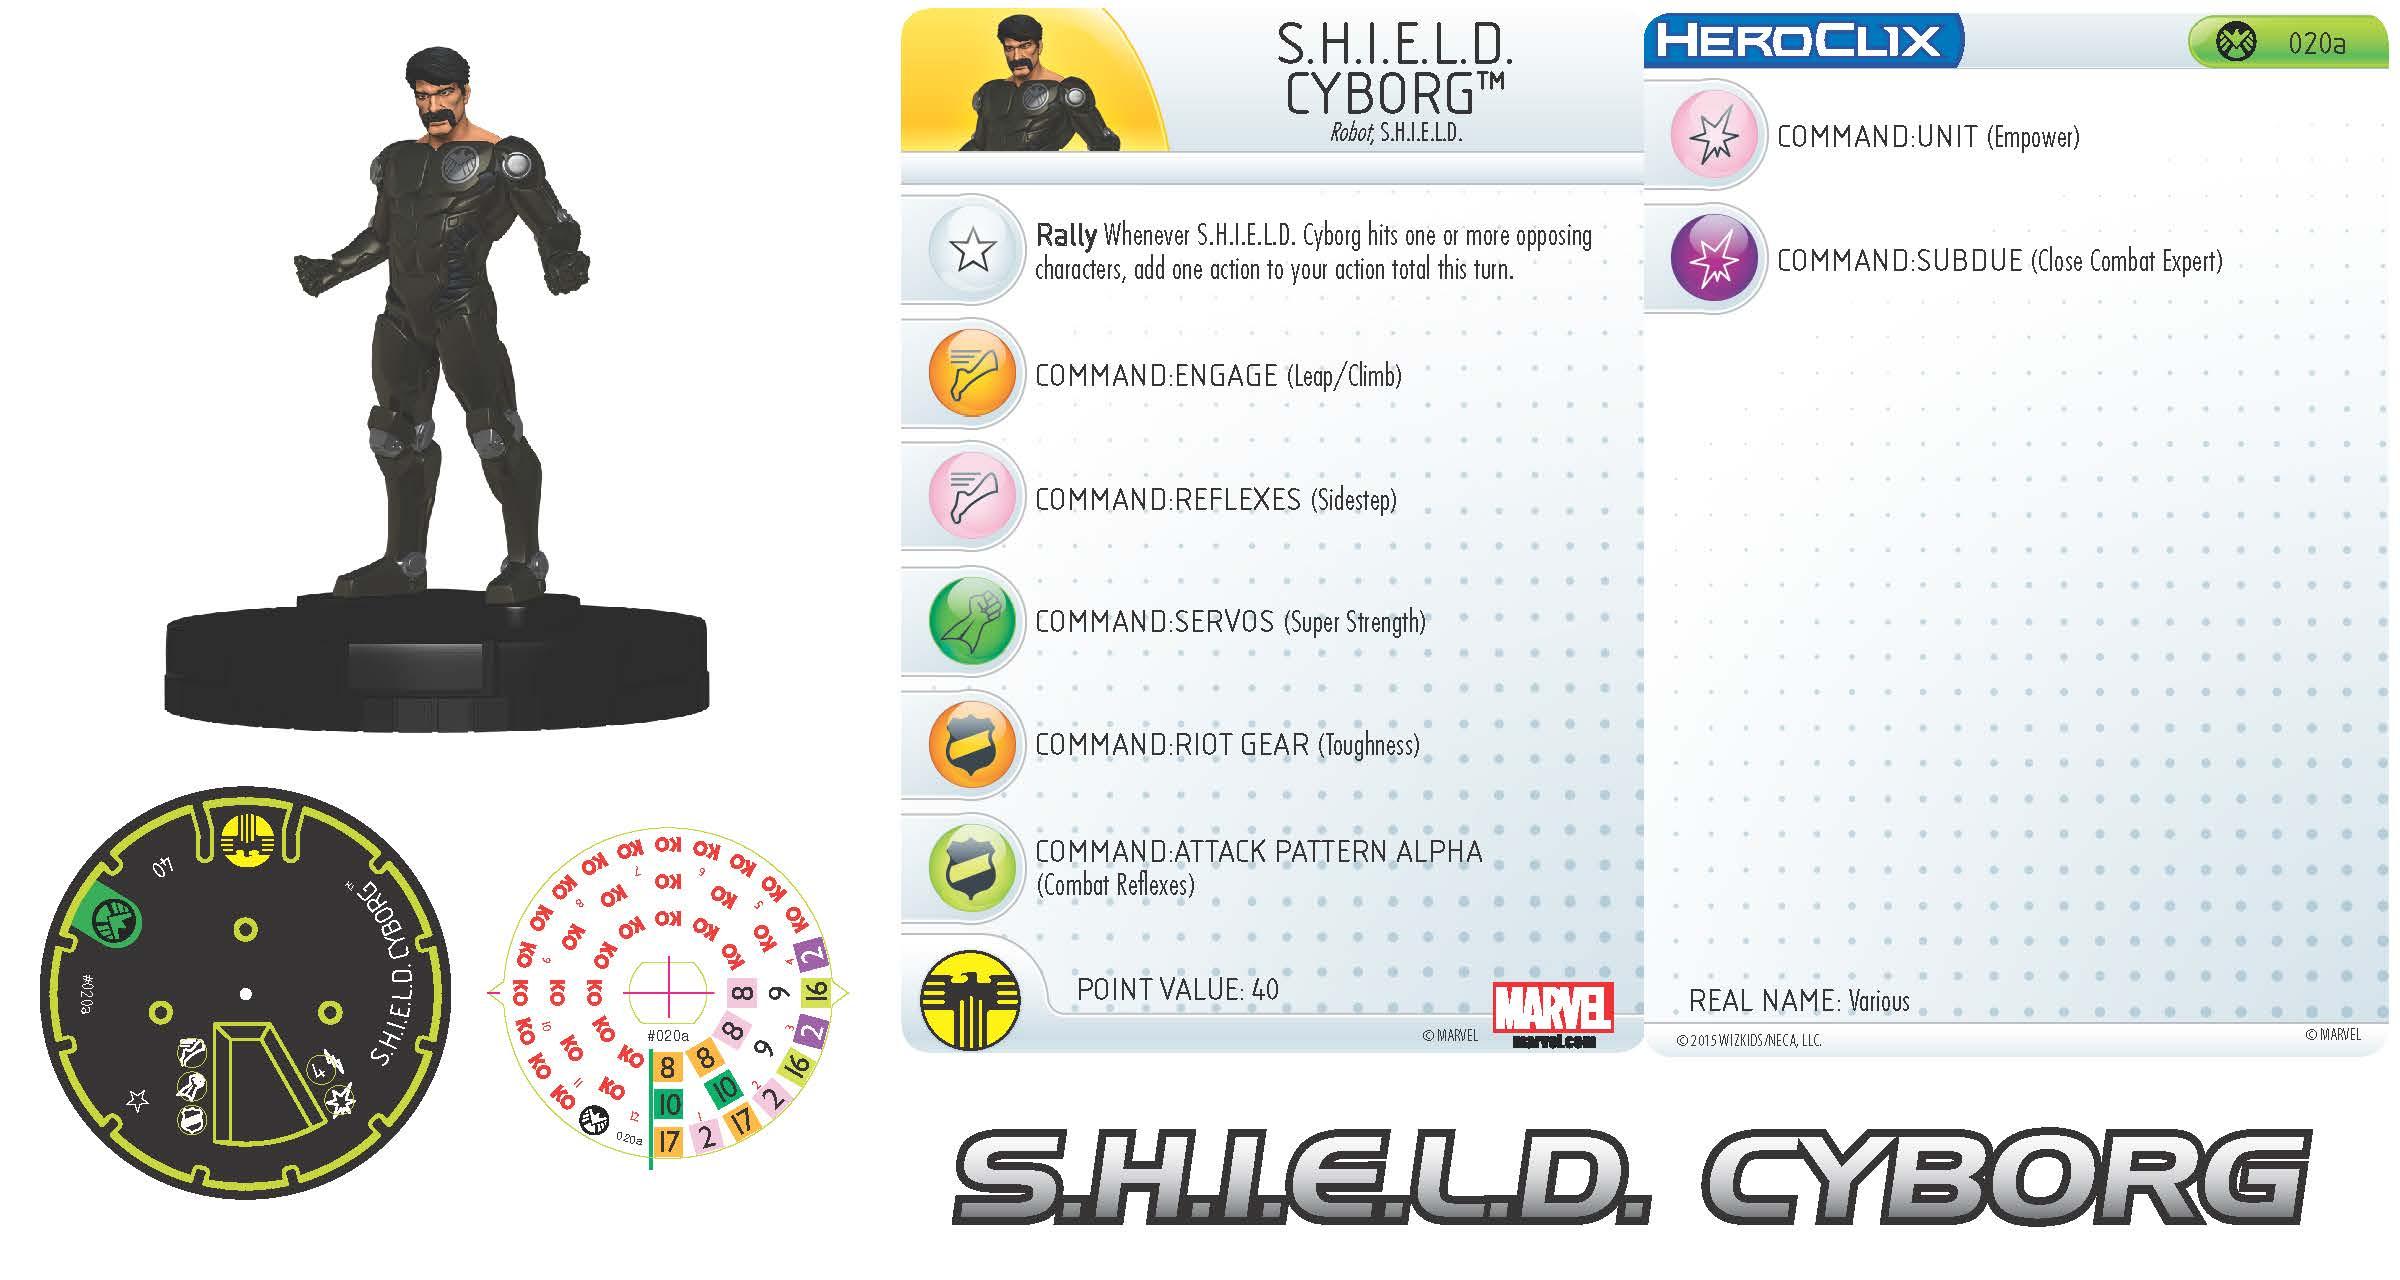 Marvel HeroClix: Nick Fury, Agent of S.H.I.E.L.D.- S.H.I.E.L.D. Cyborg